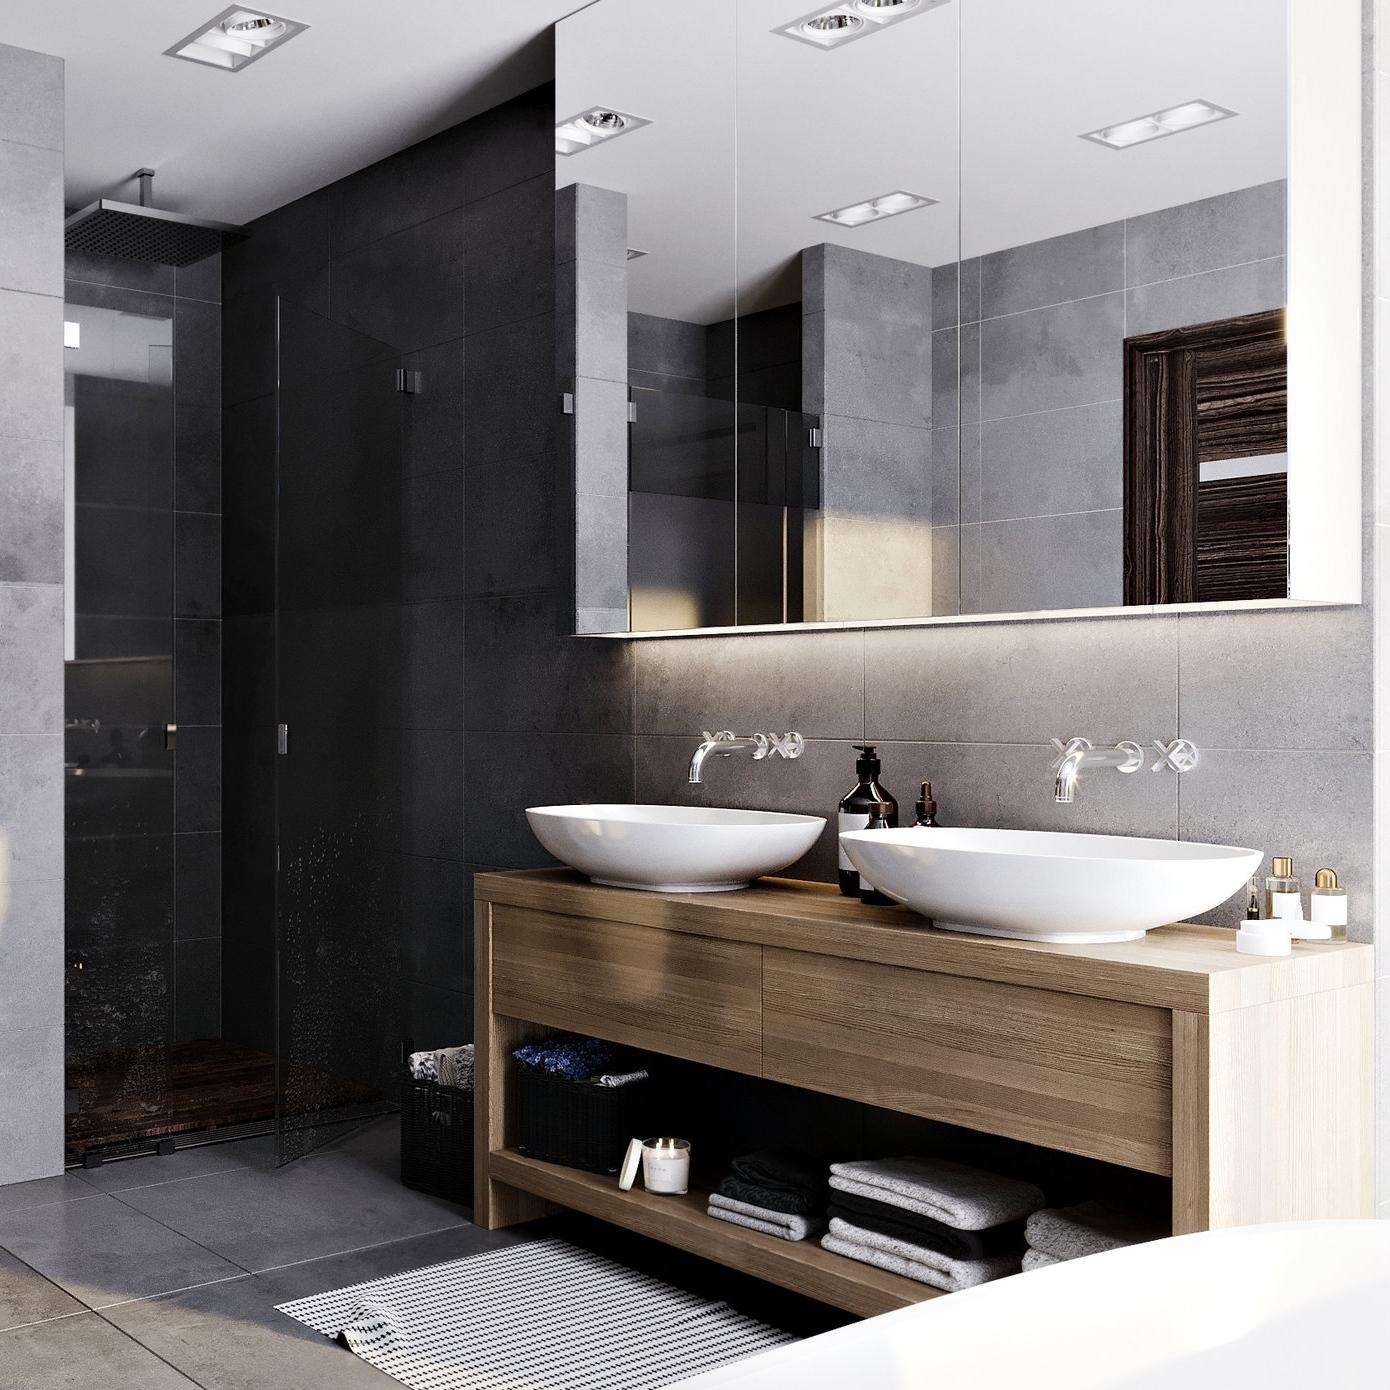 ssr-bathroom-02.jpg